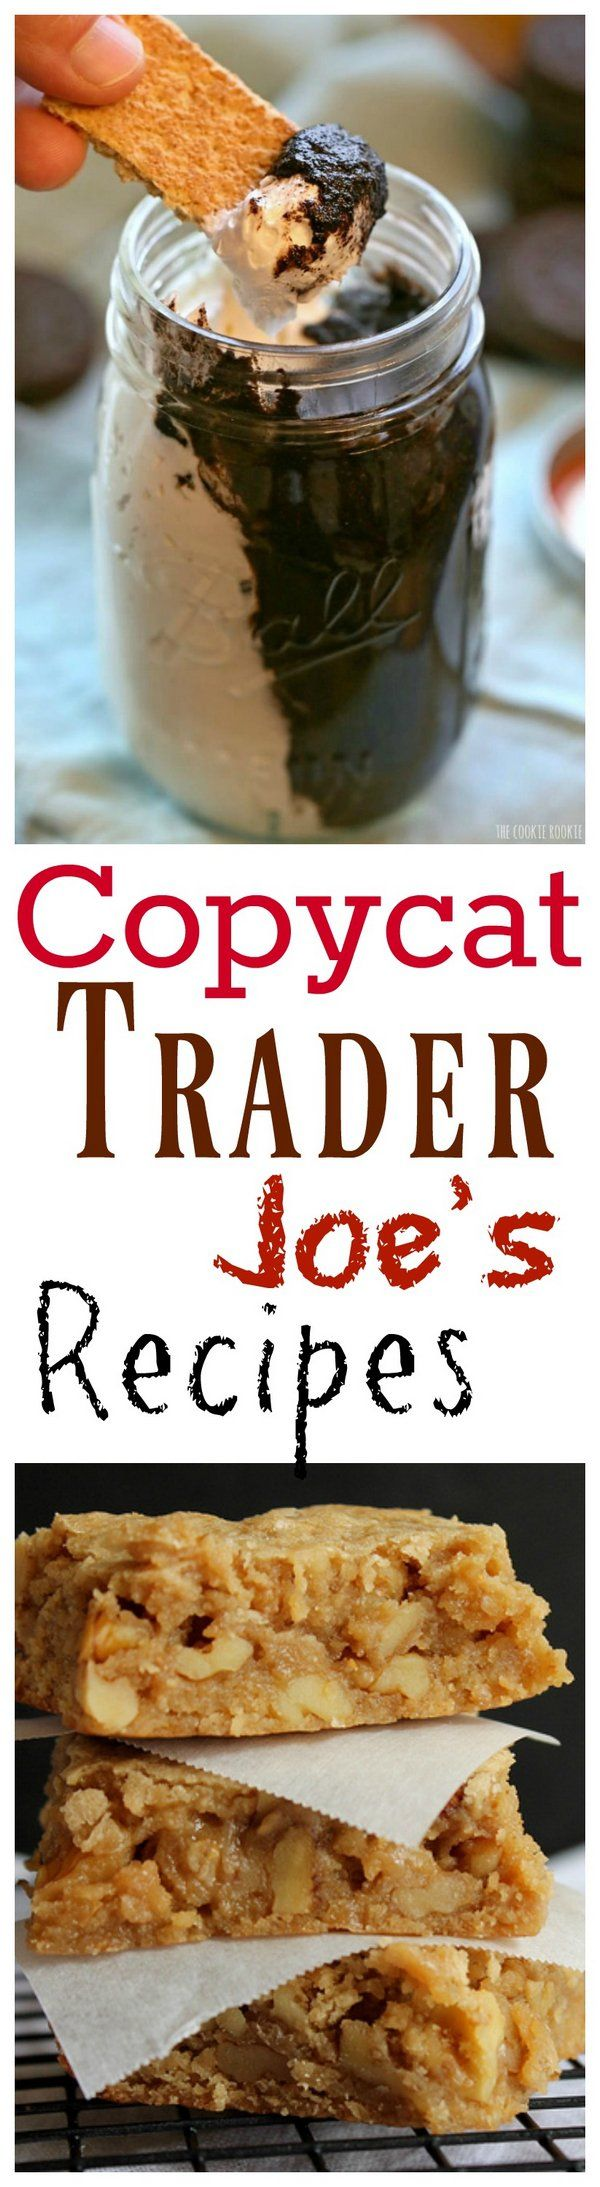 16 Delicious Copycat Trader Joe's Recipes You Can Make at home!